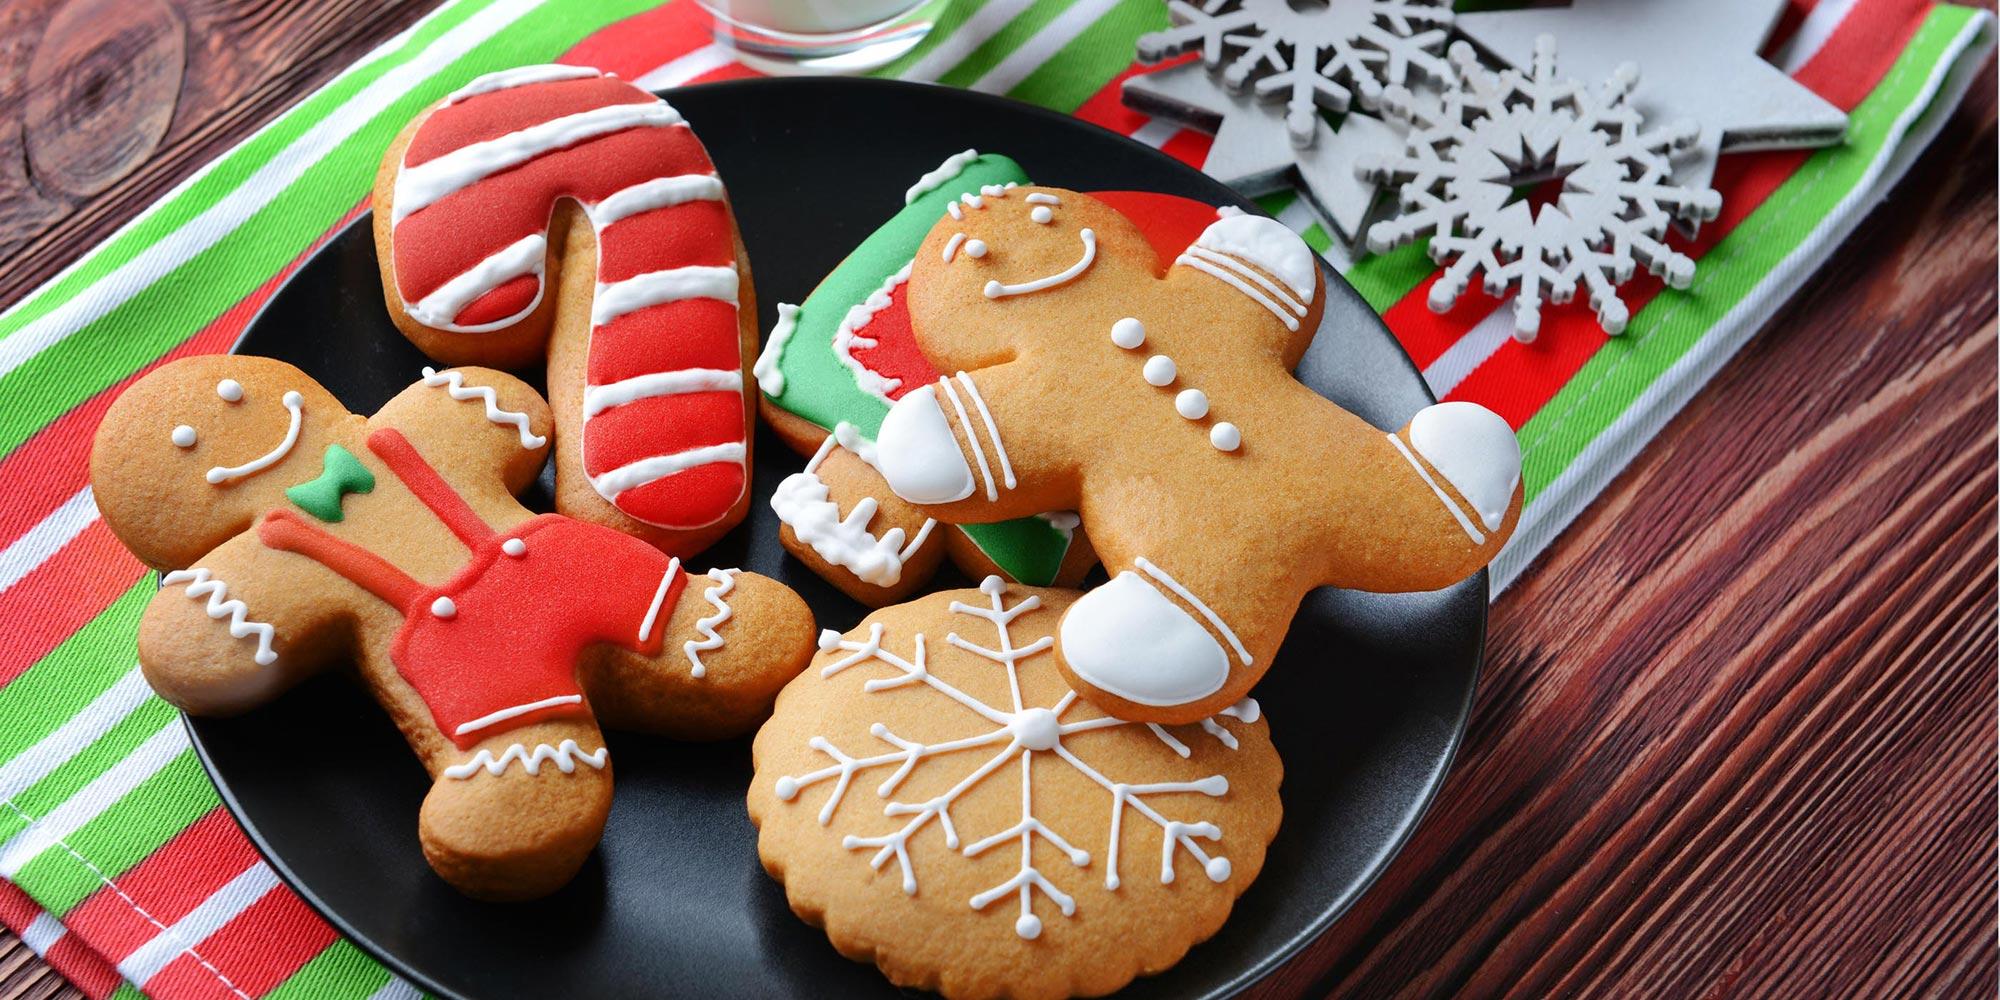 Gingerbread Cookies Recipe No Calorie Sweetener Sugar Substitute Splenda Sweeteners